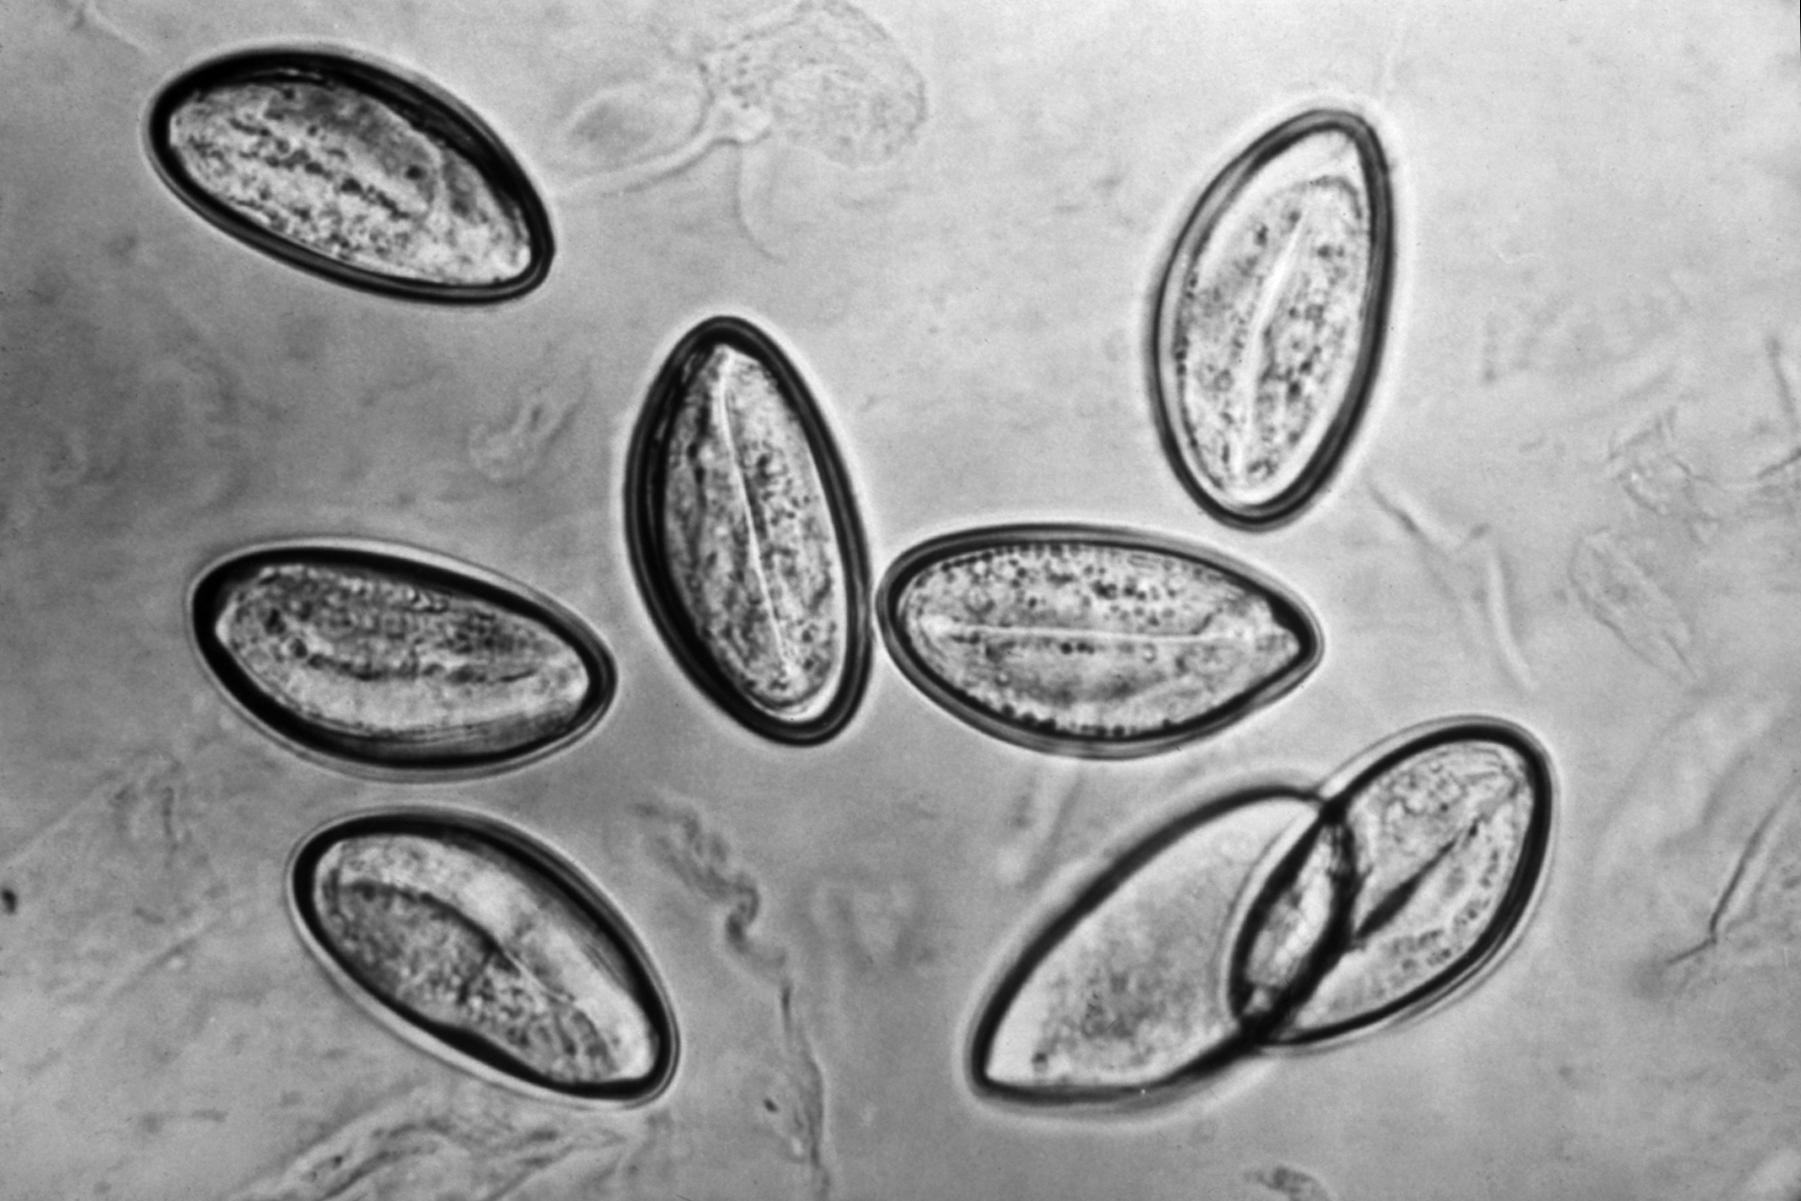 enterobius vermicularis roundworm pachet detoxifiere turcia